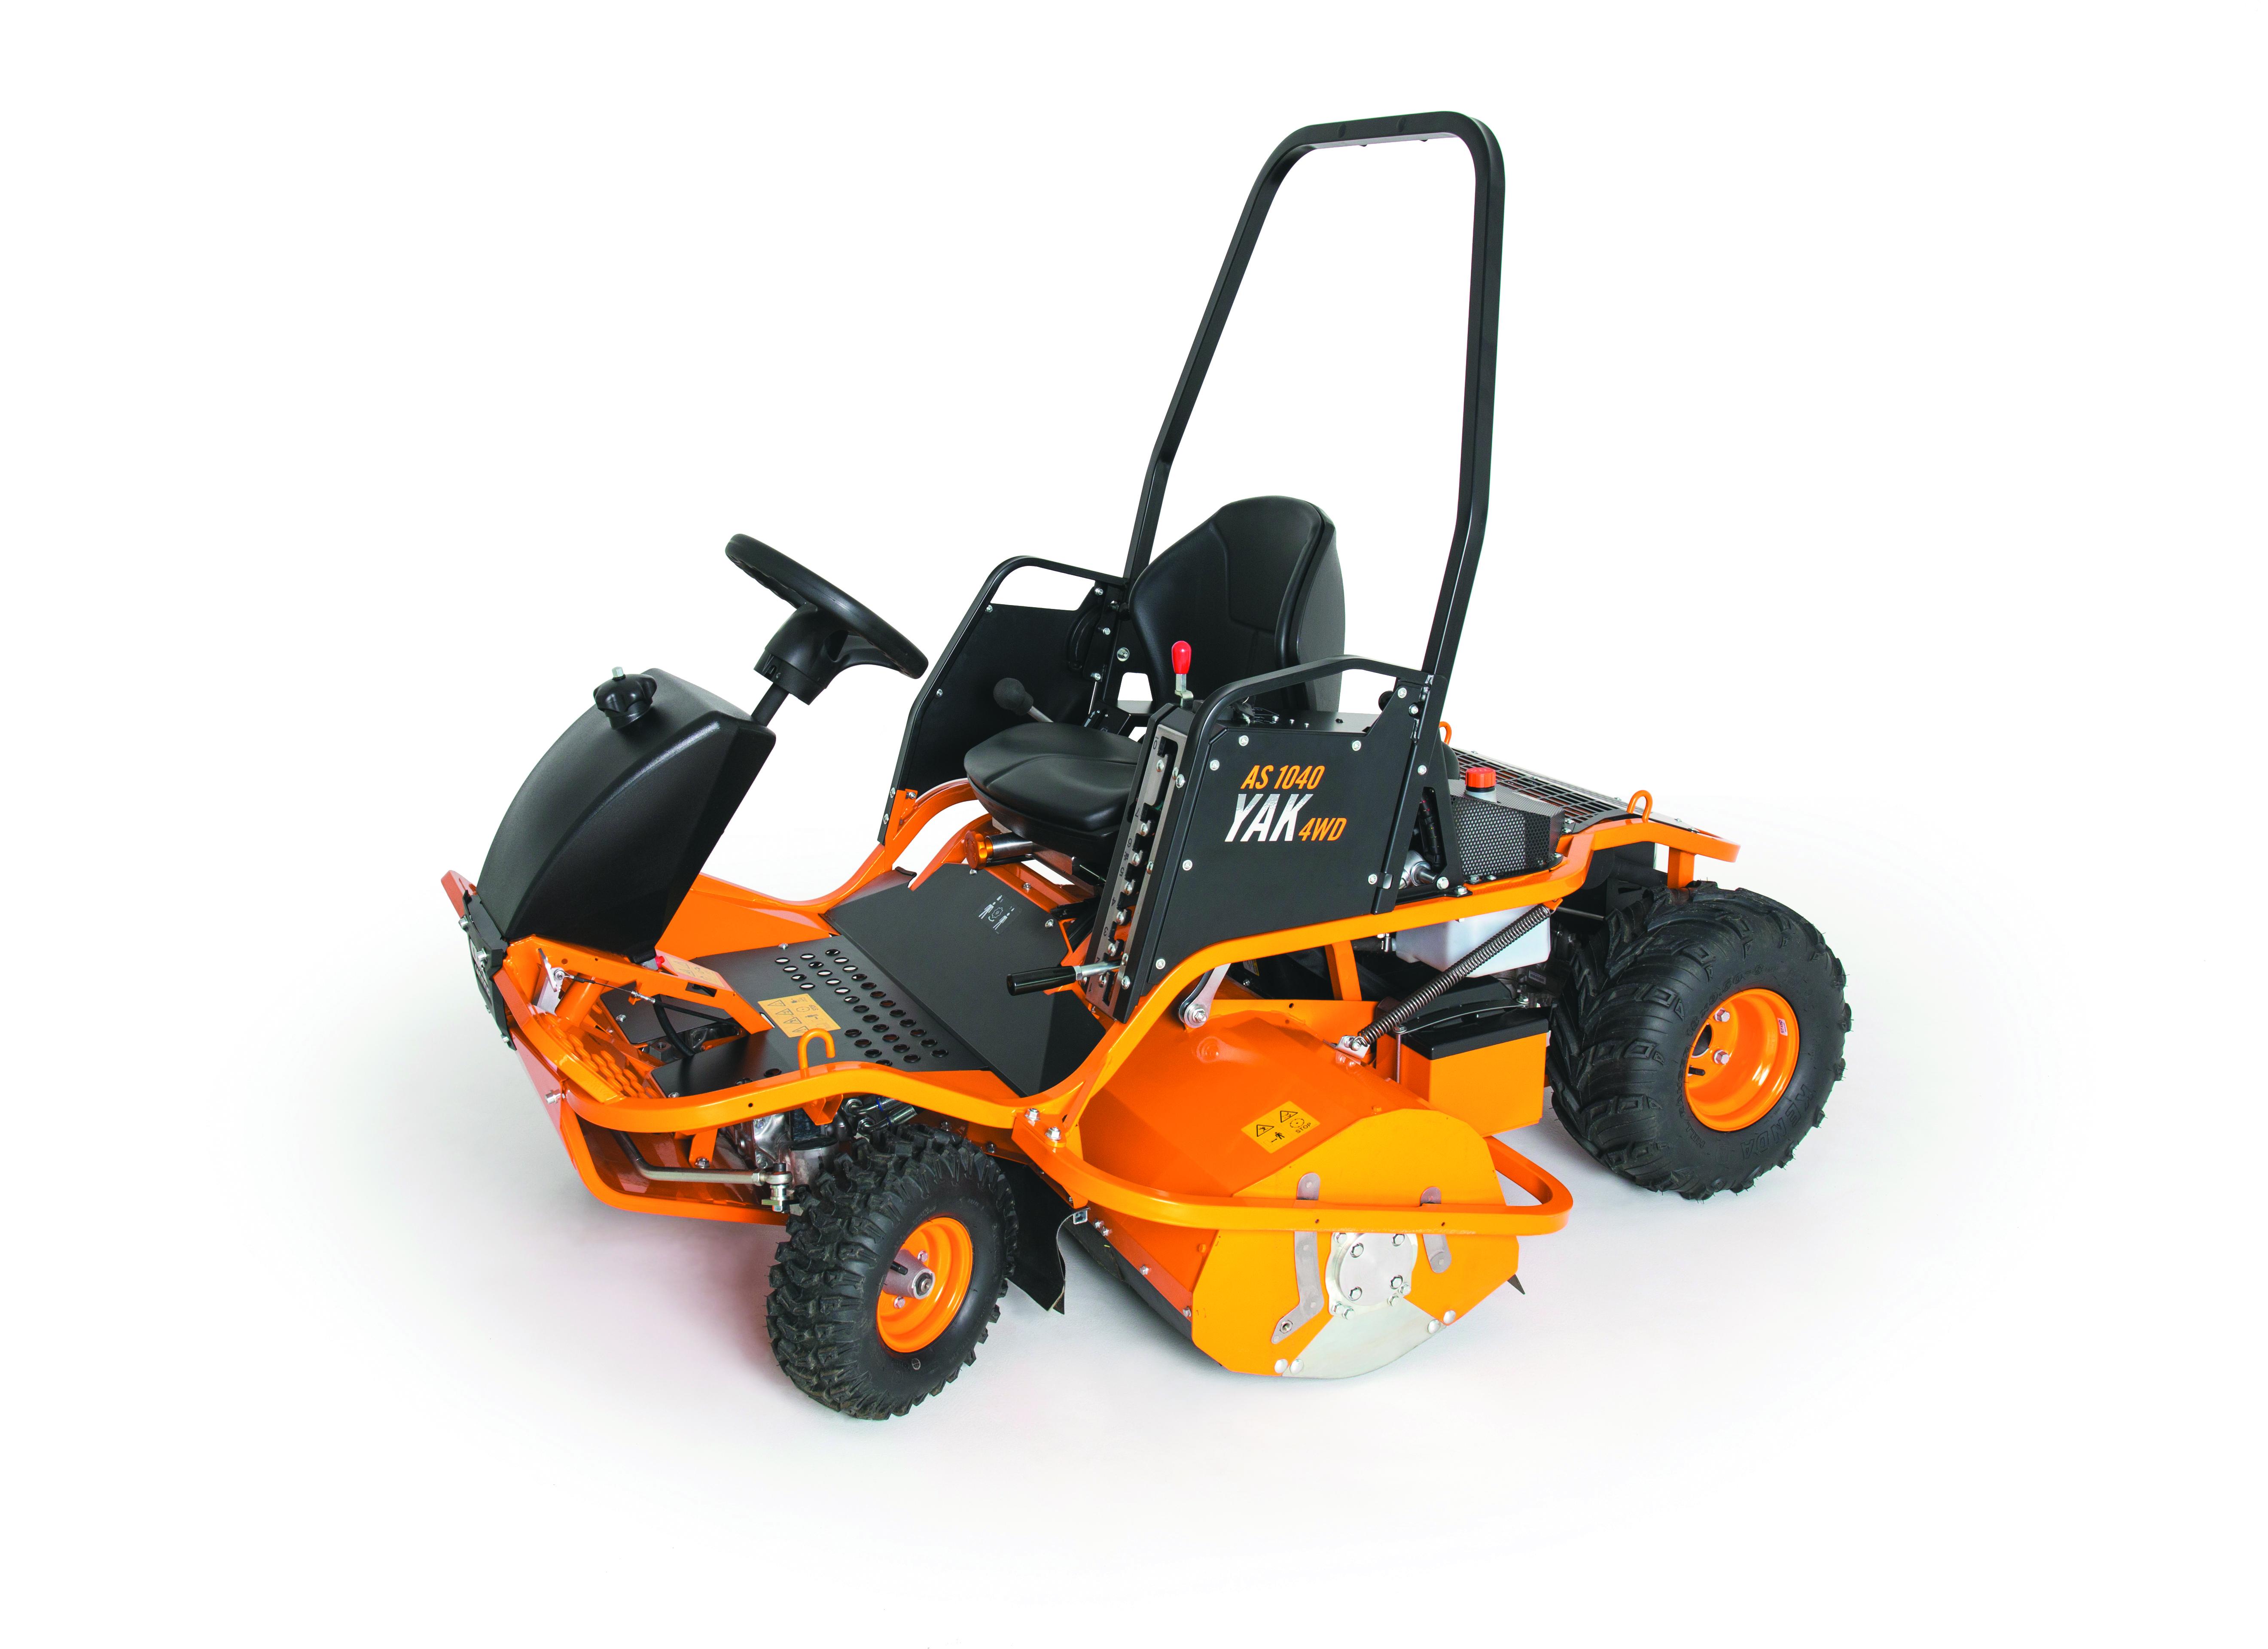 AS 1040 YAK 4WD | [COM] AS-Motor